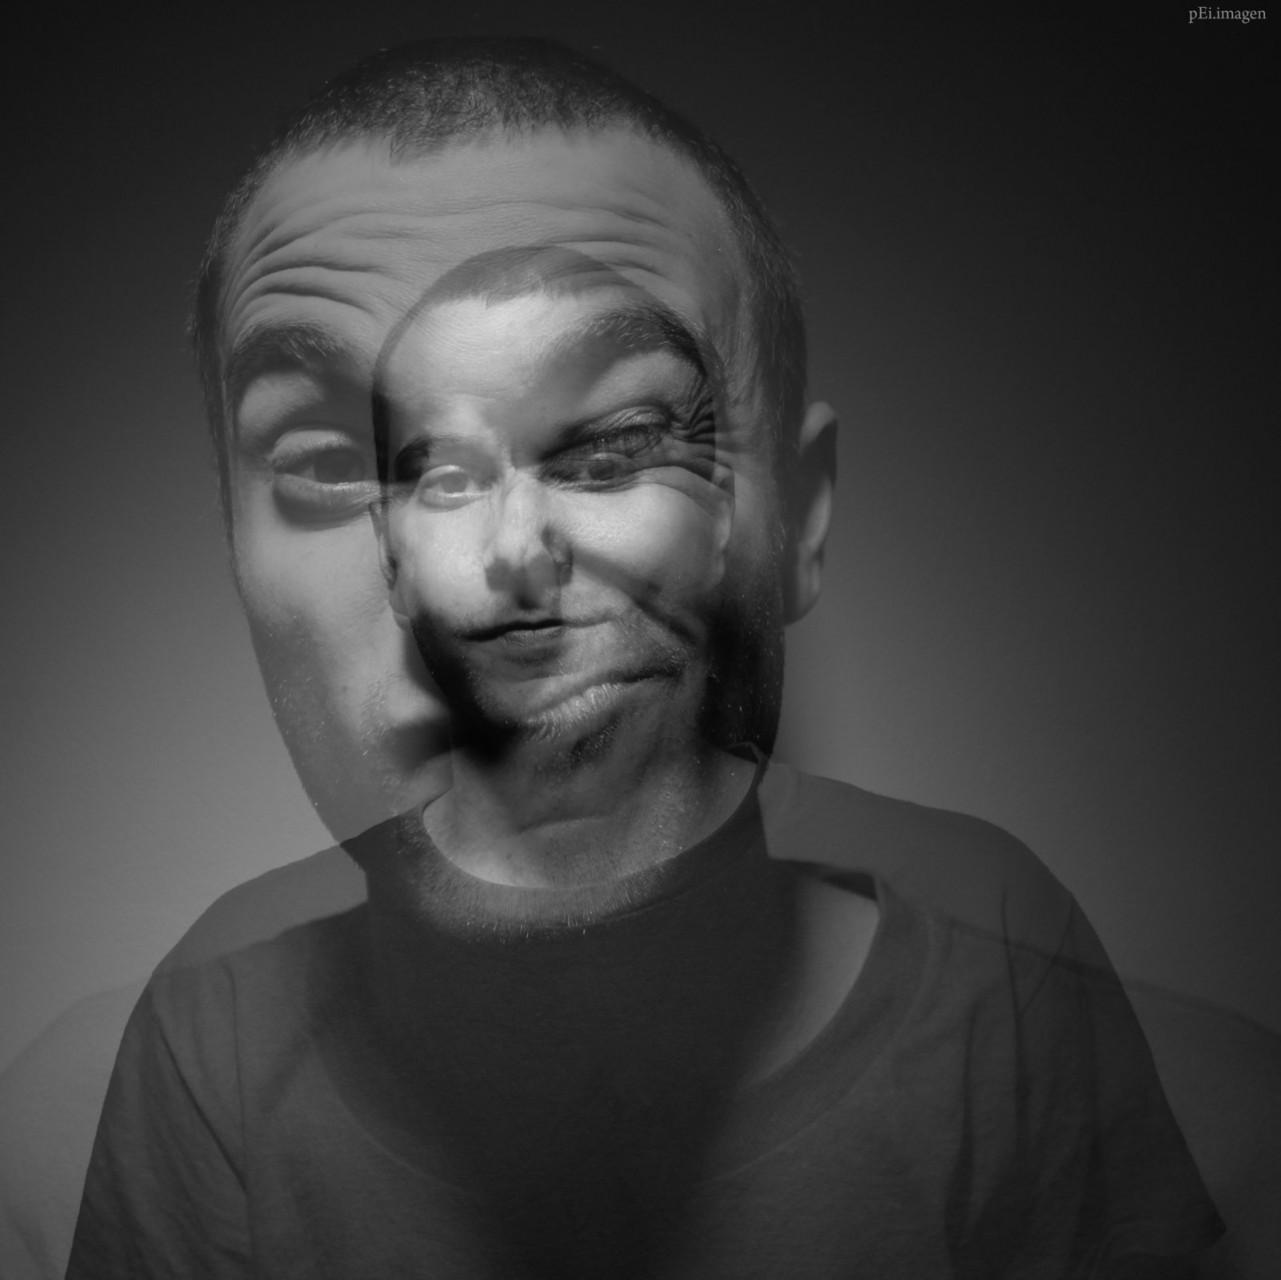 peipegata me myself I proyectos fotografia peipegatafotografia # 005 Alberto Gonzalez-Garces